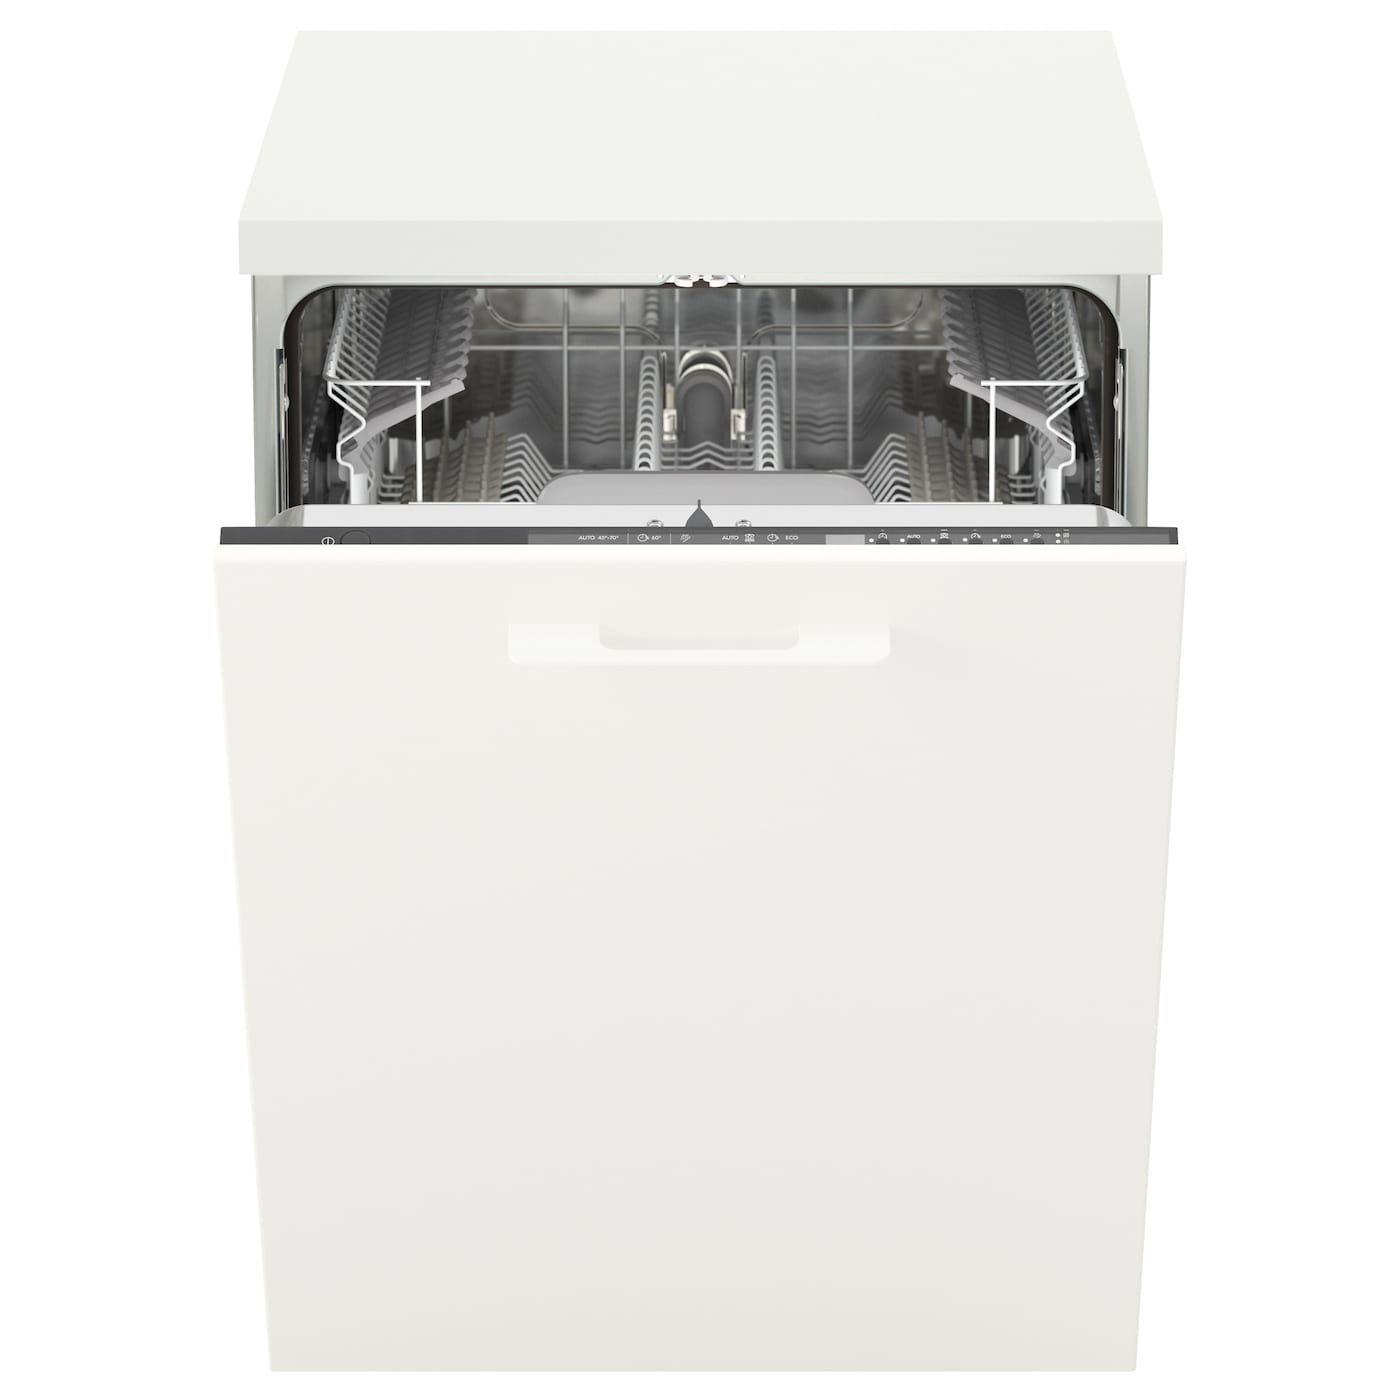 Skinande Integreret Opvaskemaskine Gra Ikea In 2020 Ikea Arbeitsplatte Geschirrspuler